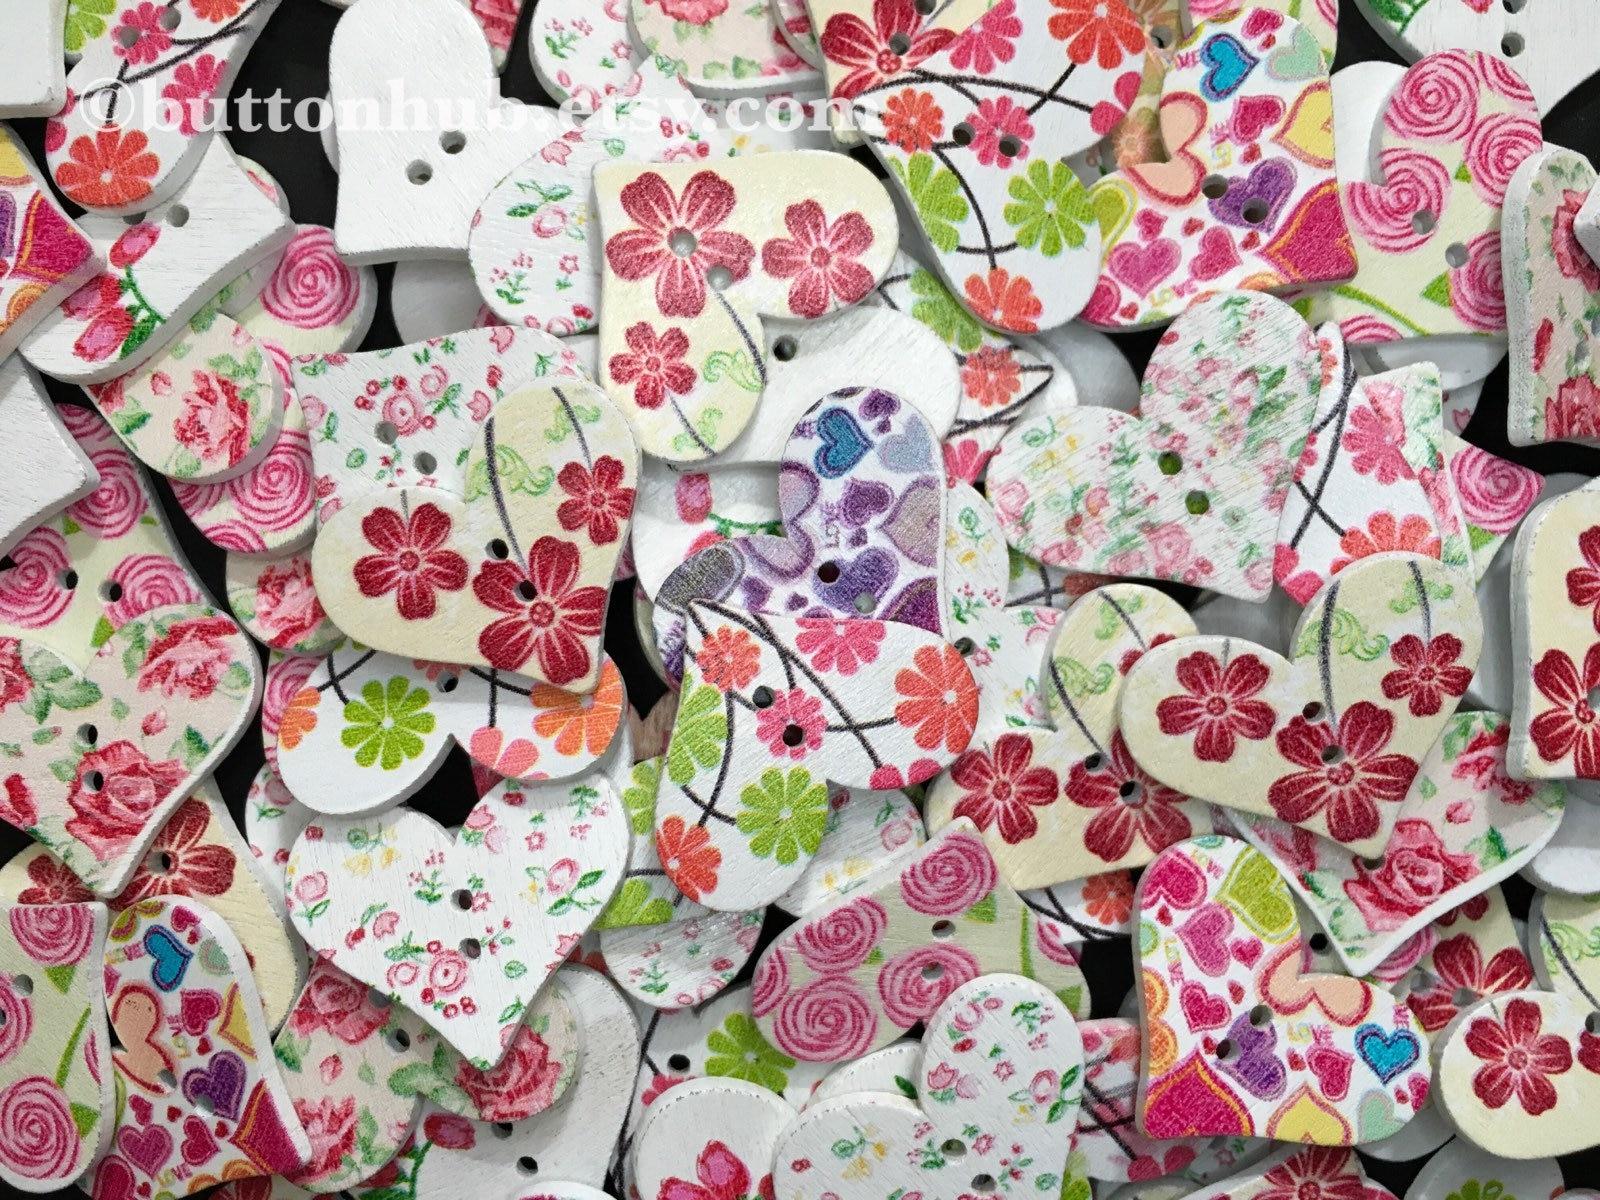 10 Purple /& Blue Daisy Butterfy Flower Wooden Sewing Buttons 30mm